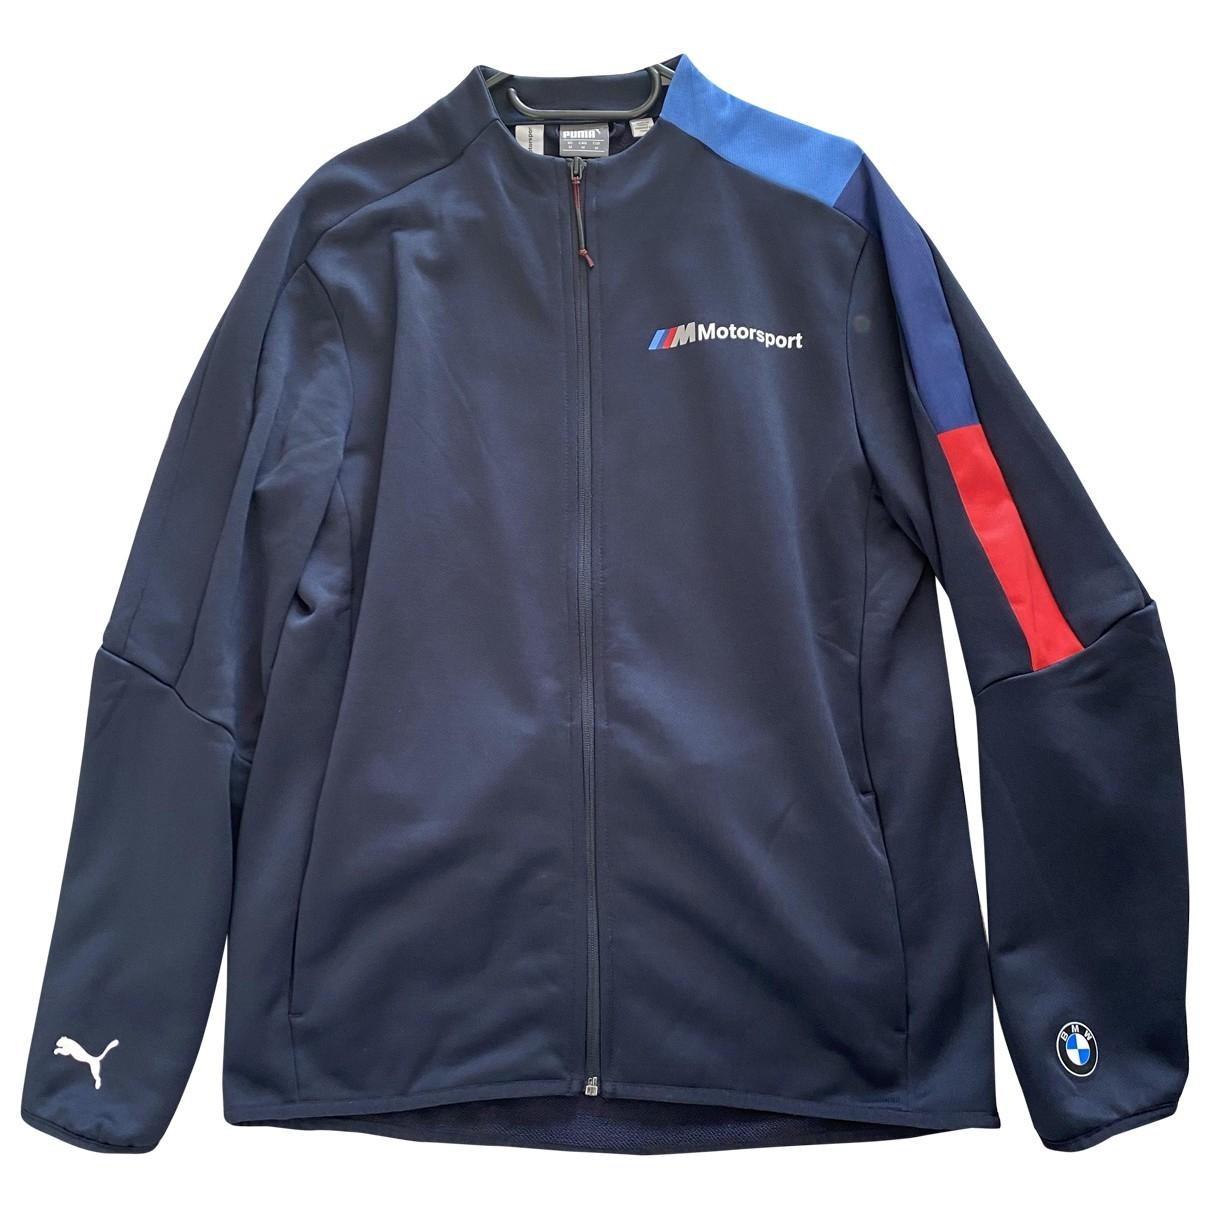 Puma \N Blue jacket  for Men M International